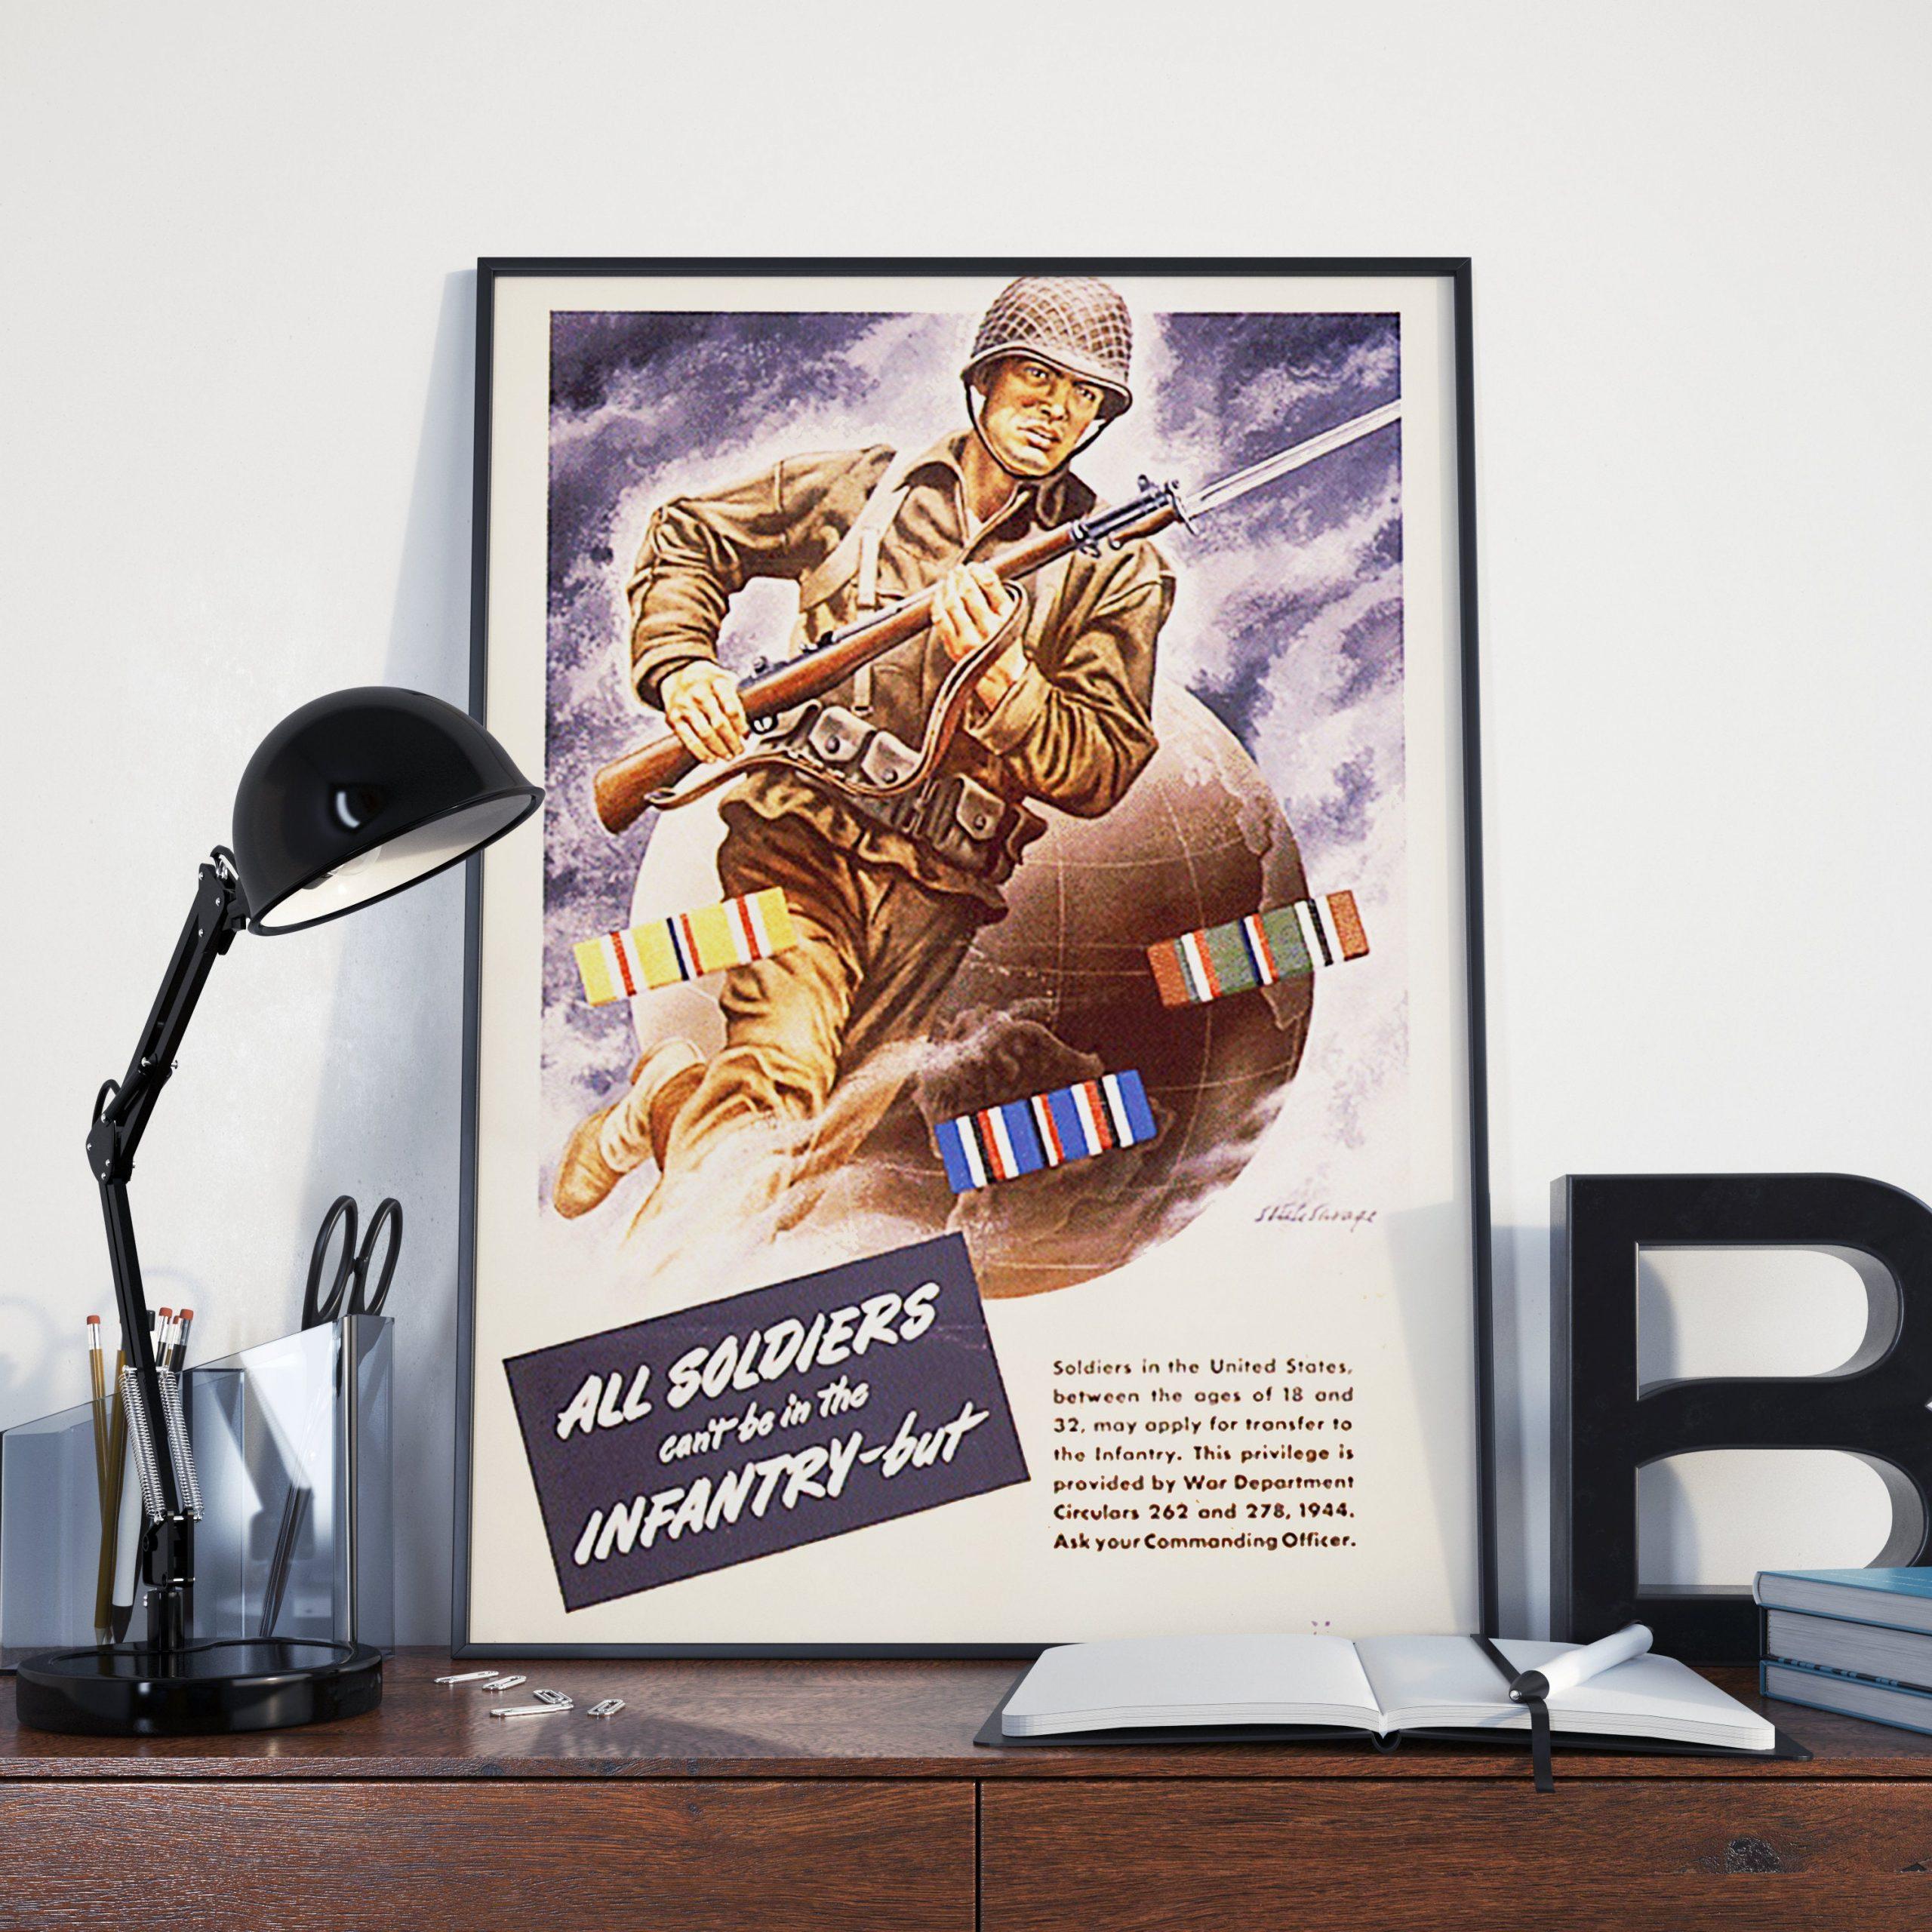 Vintage Ww2 World War 2 Infantry Propaganda World War 2